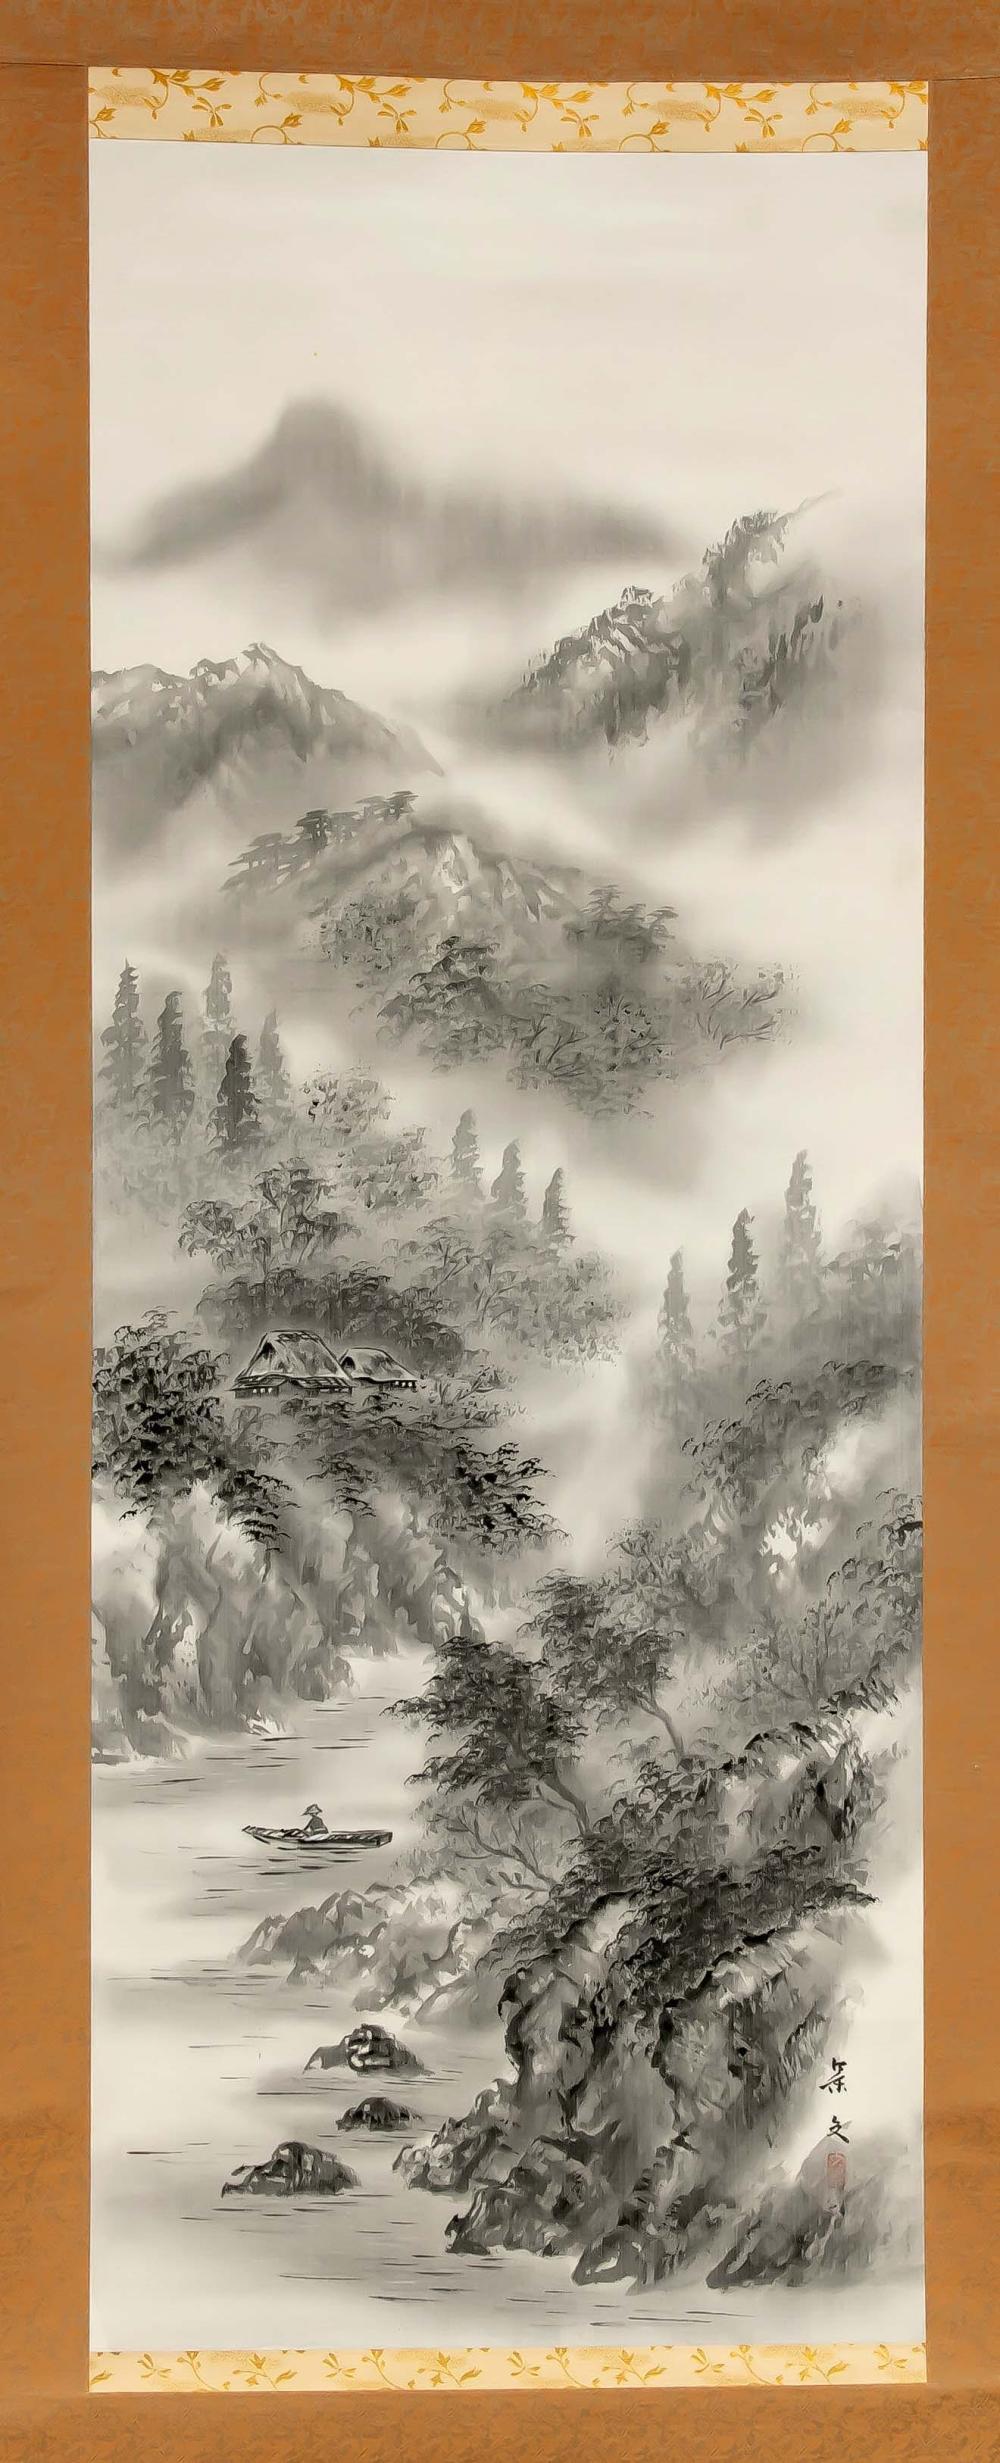 Keibun? Landscape with river a